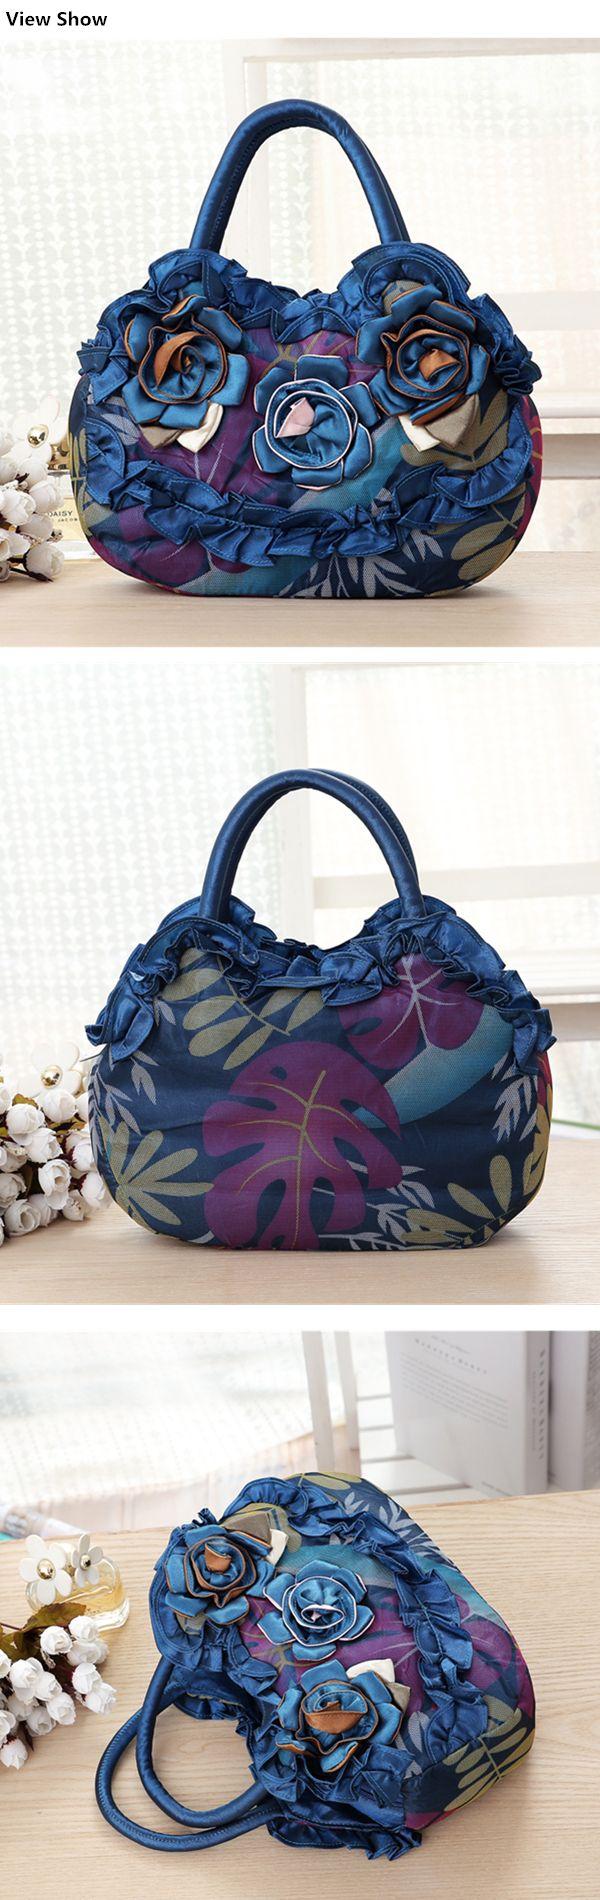 Women National Floral Polyester Handbag